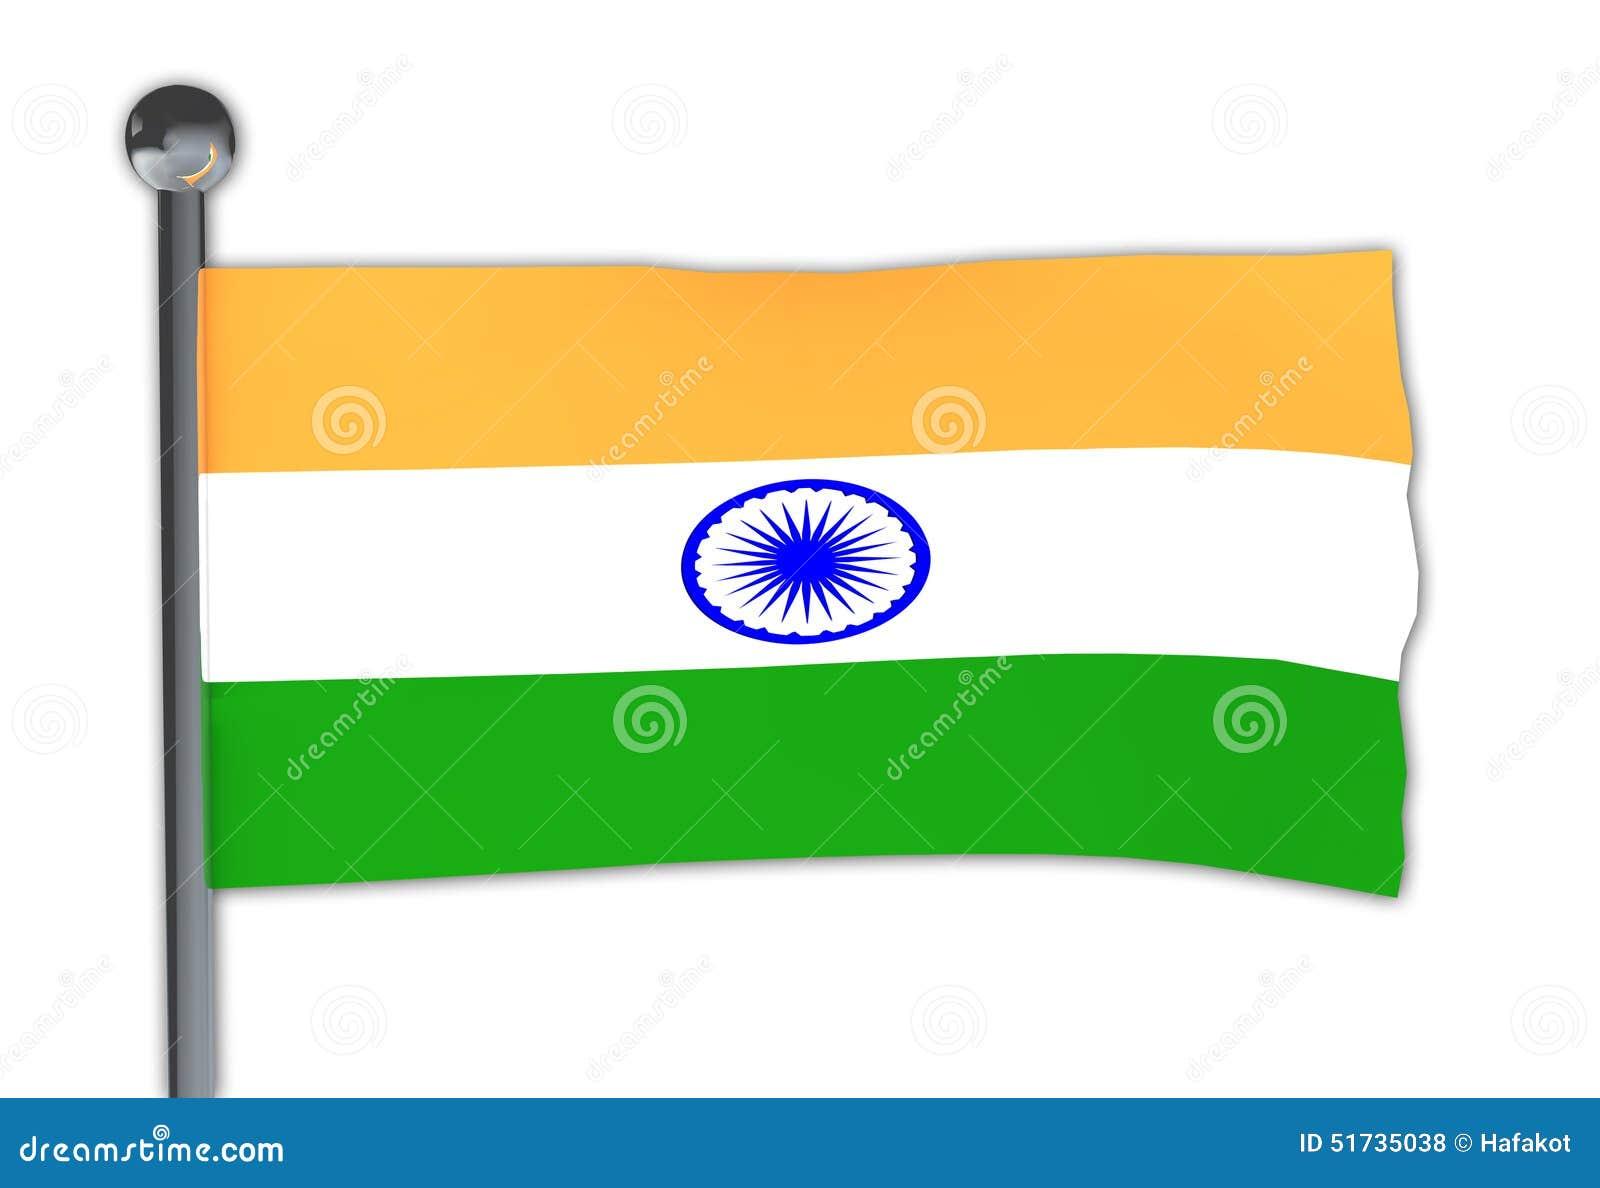 Stock Photo Flag India Pole Waving Wind Over White Background Image51735038 on Indian Flag With Pole